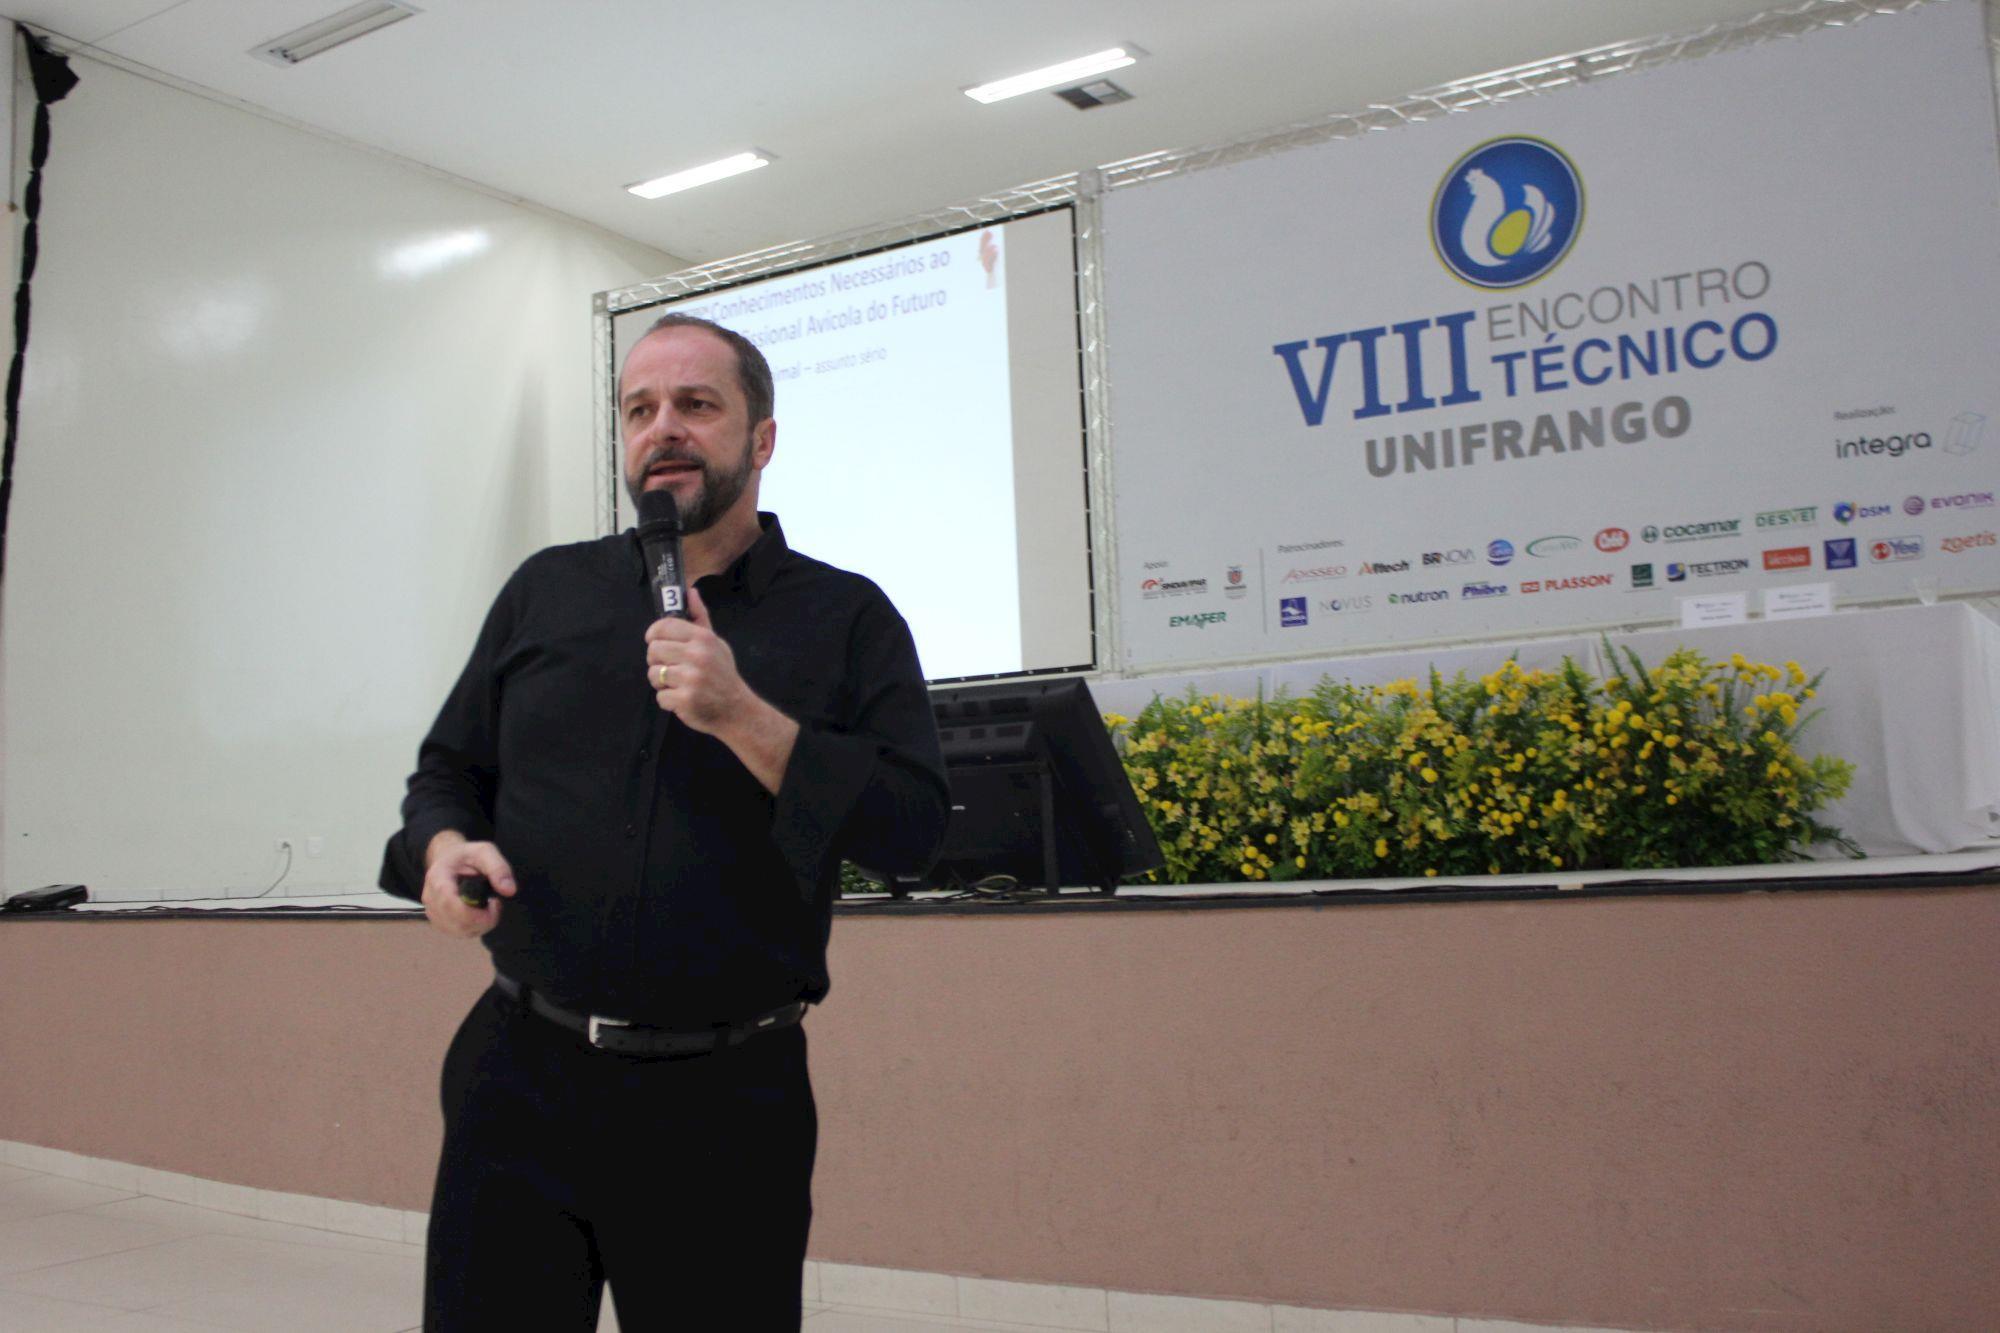 VIII Encontro Técnico Unifrango , VIII Encontro Técnico Unifrango